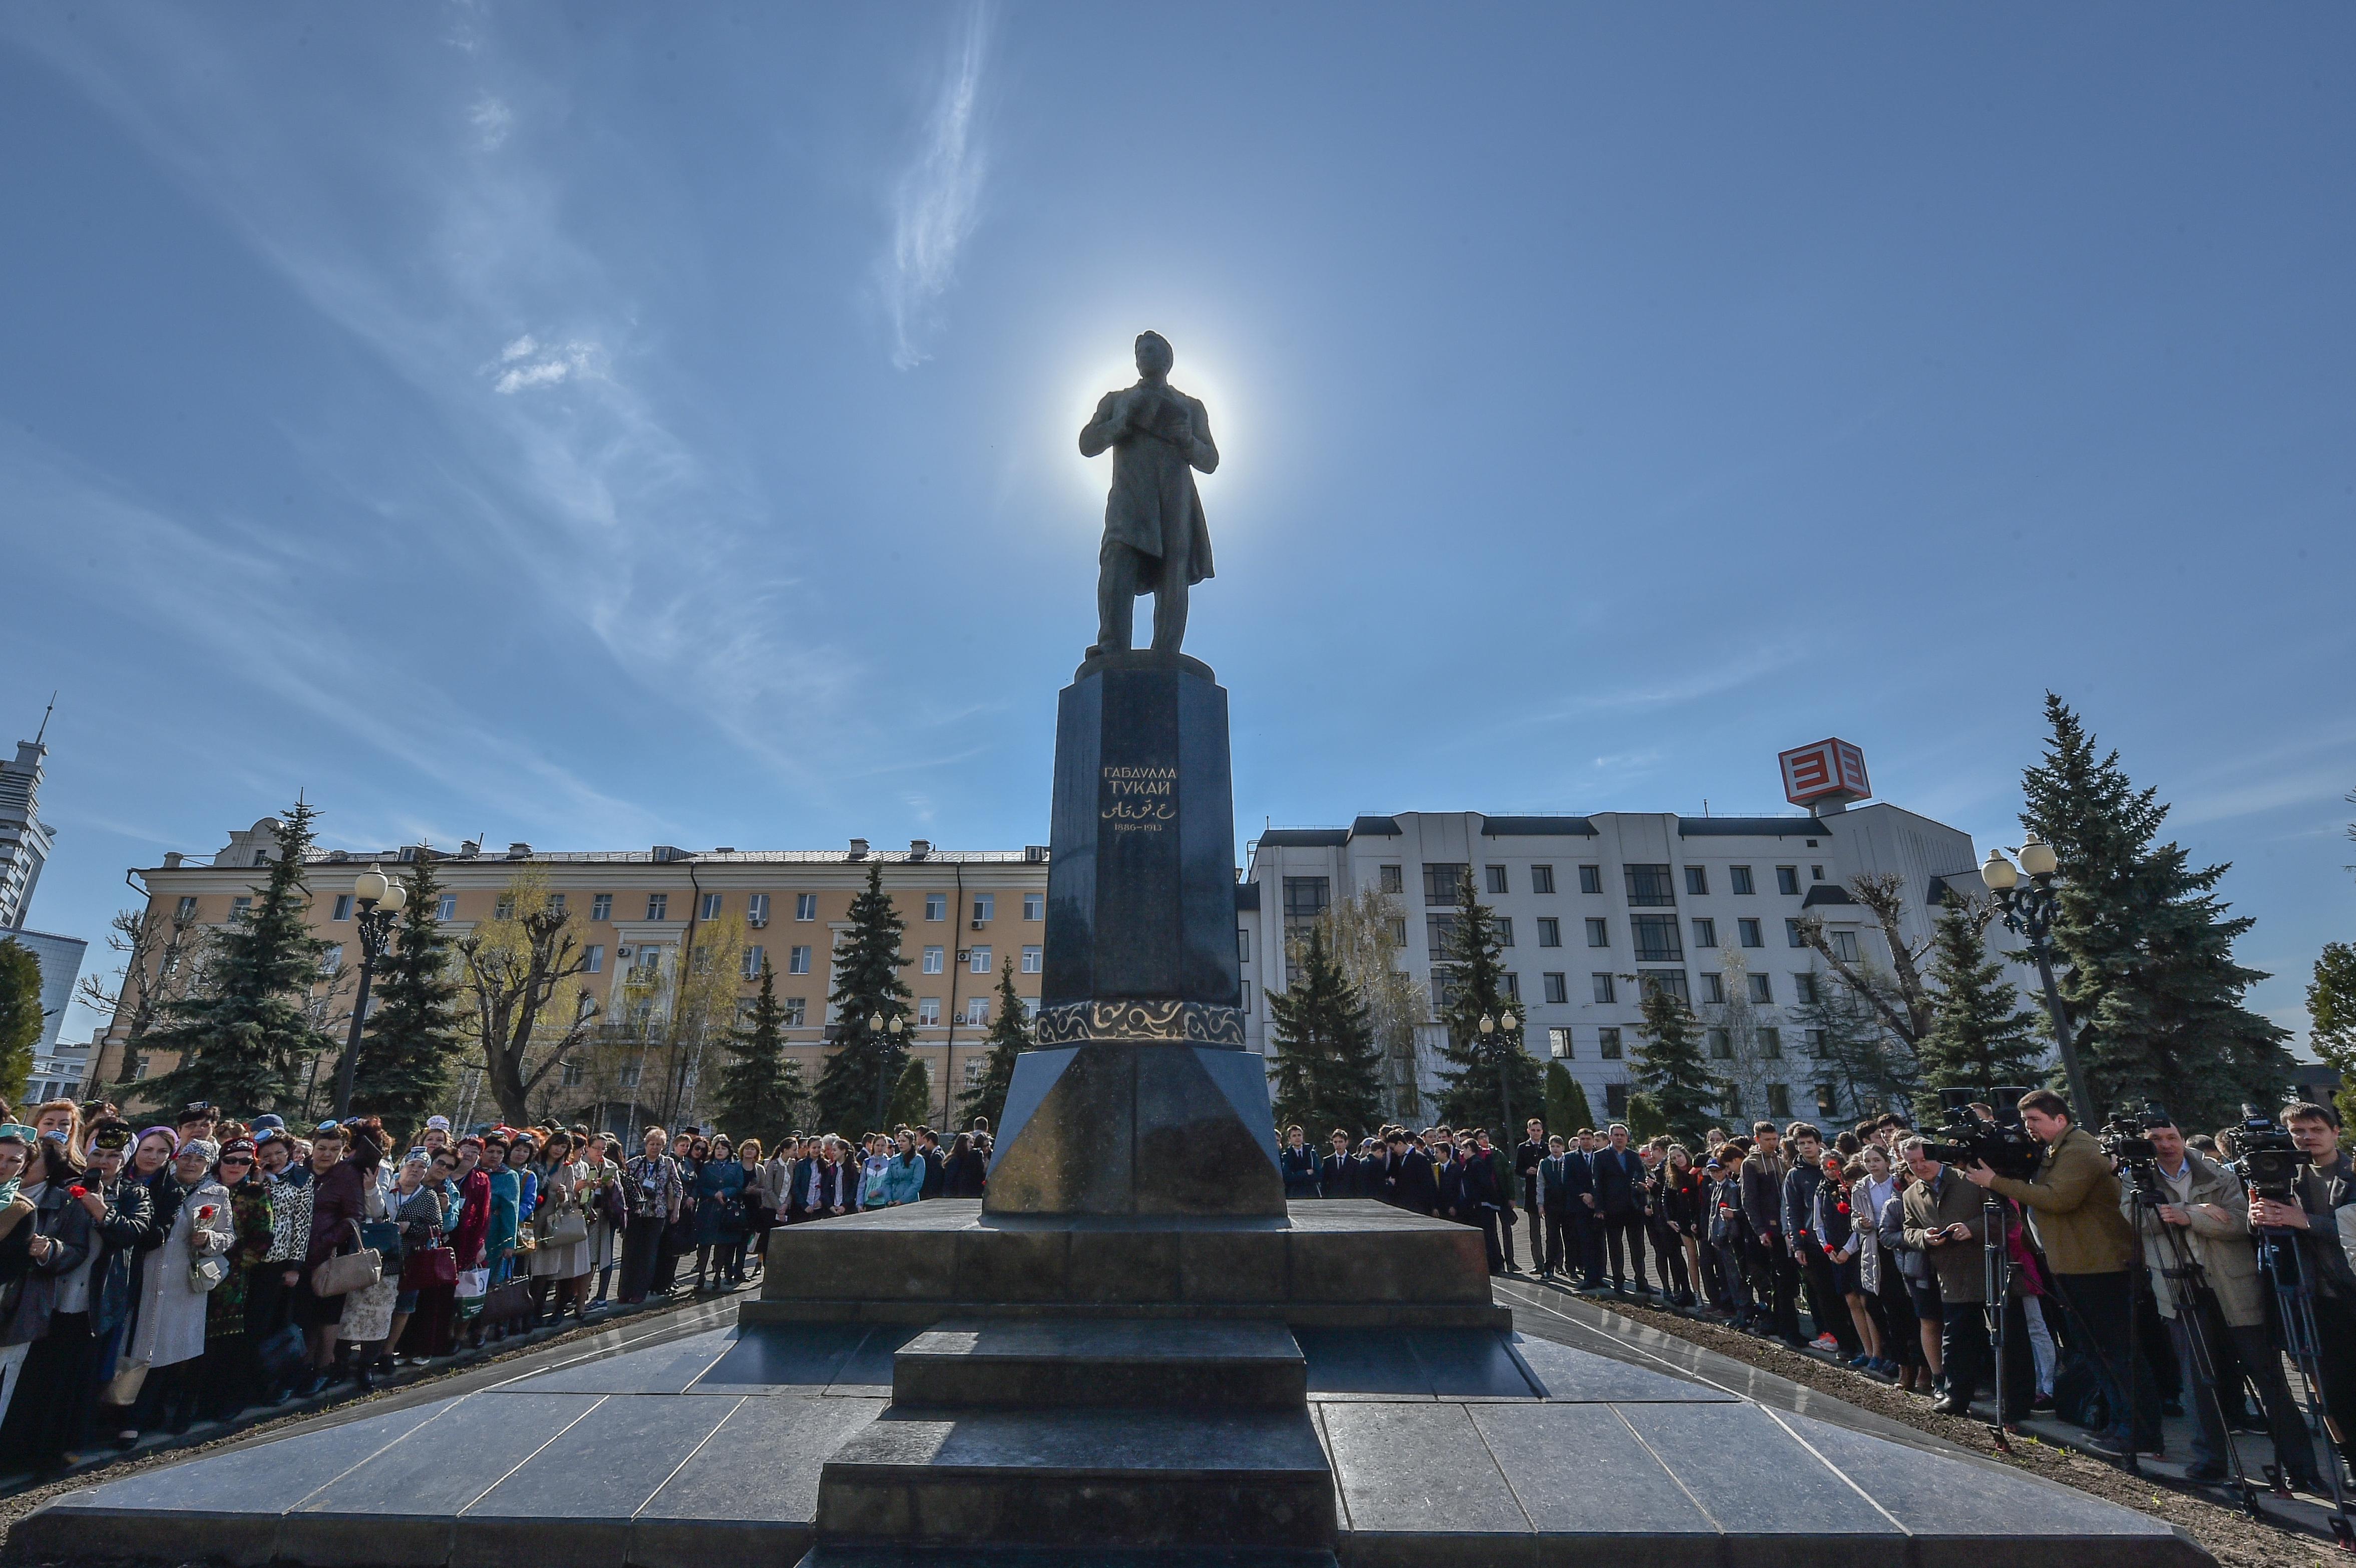 gabdulla-tukaj-foto-culture-cap-ru